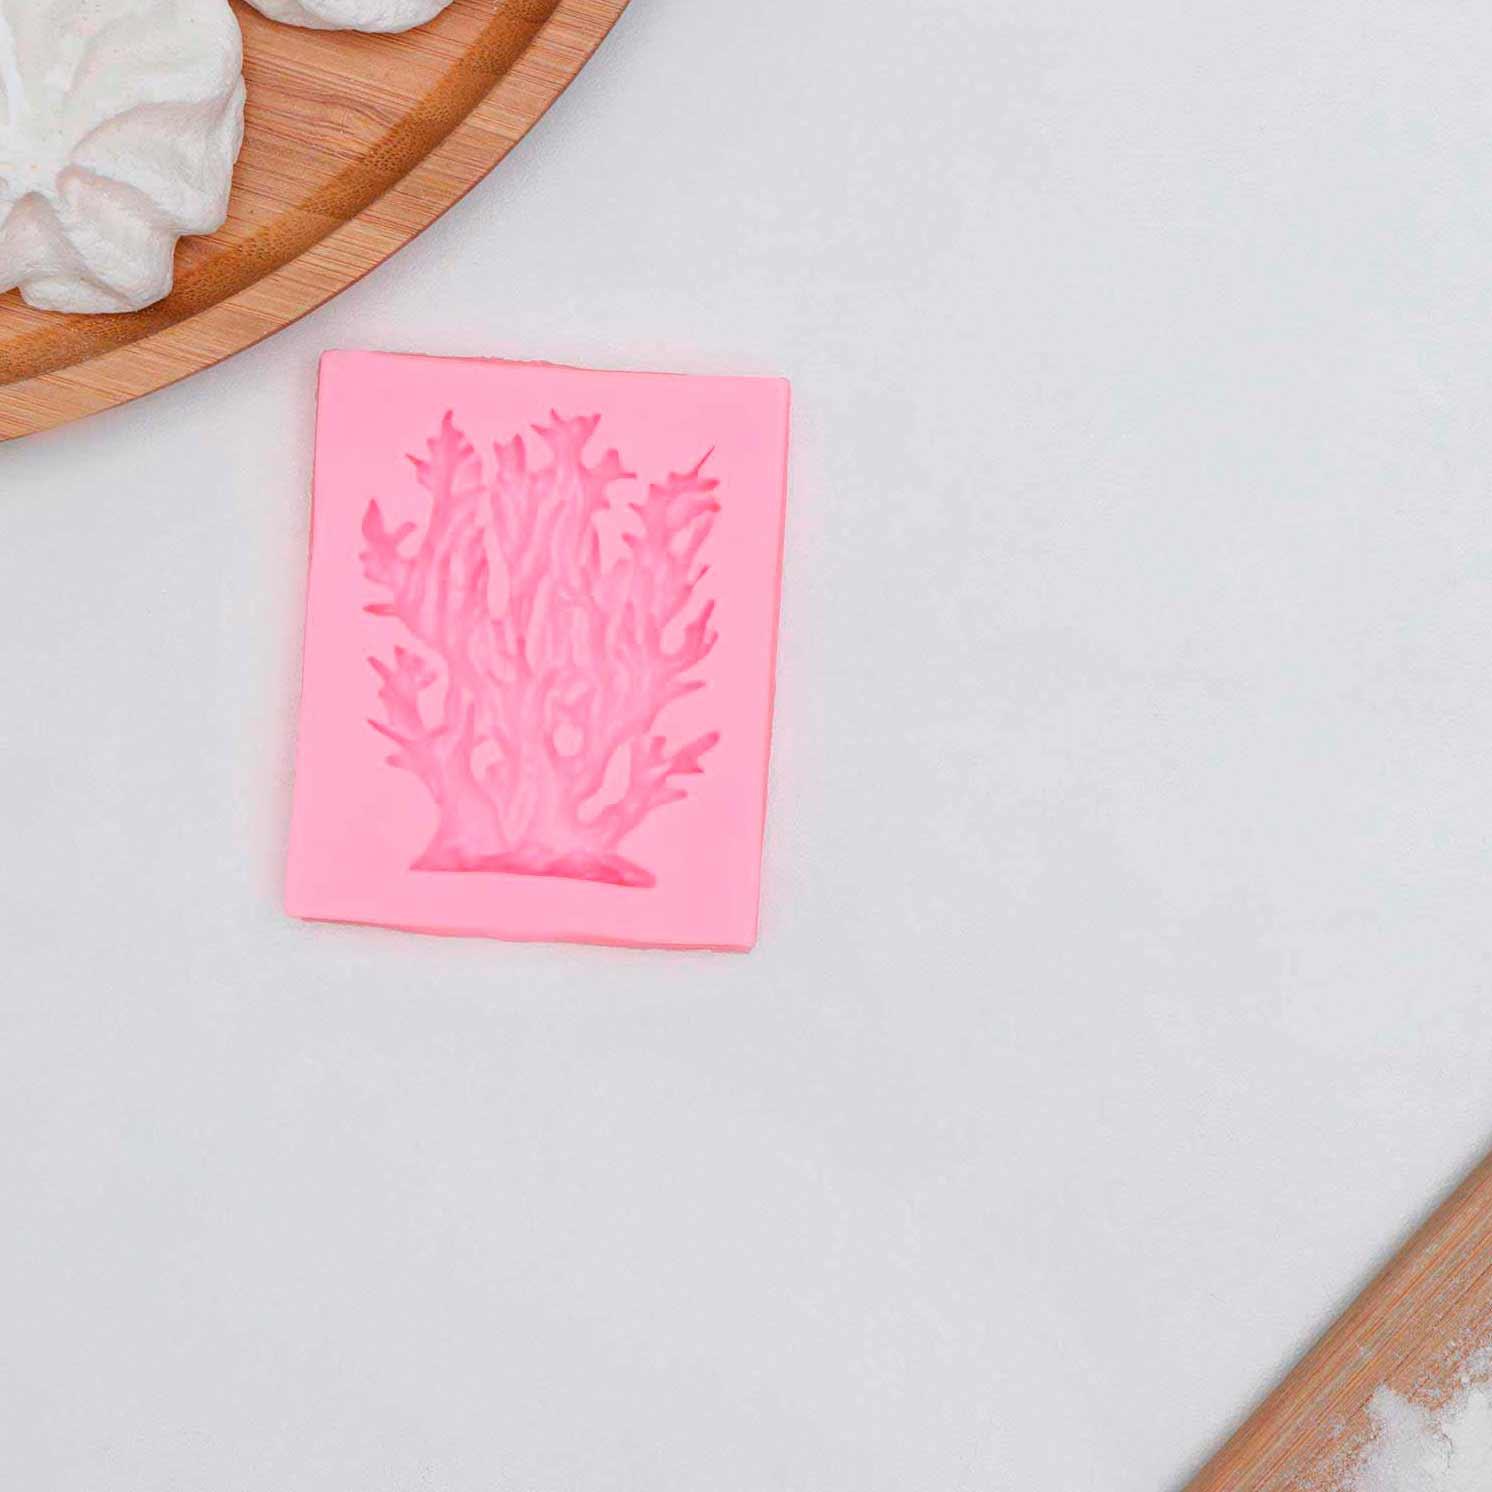 Молд «Коралл», 6×5,5×1 см, цвет розовый